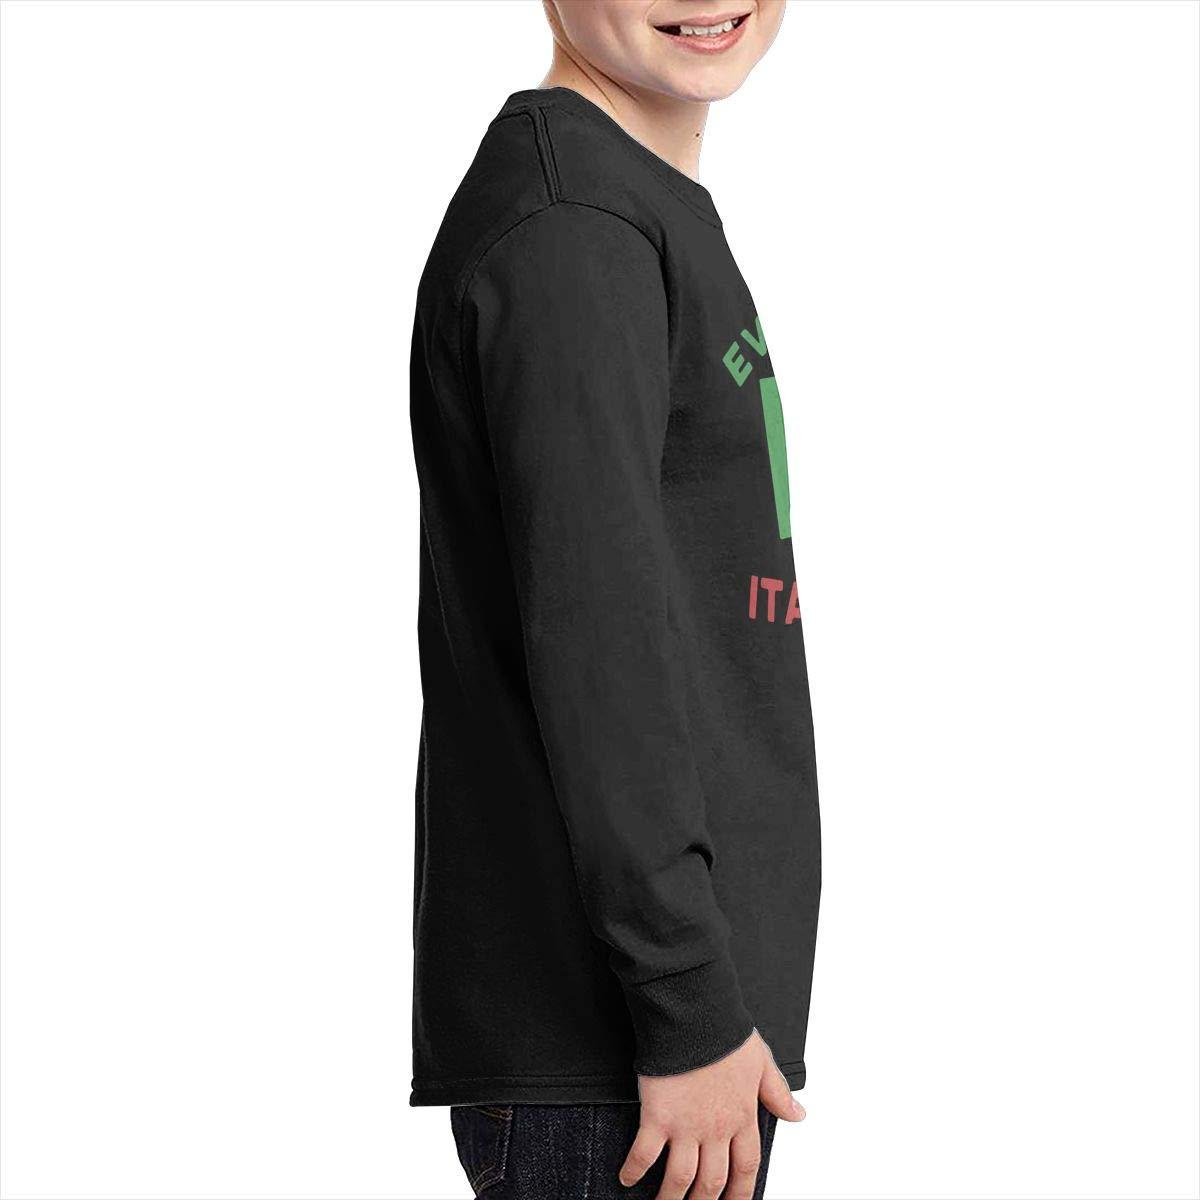 Teenagers Teen Girls Everyone Loves A Nice Italian Boy Flag-1 Printed Long Sleeve 100/% Cotton T-Shirts